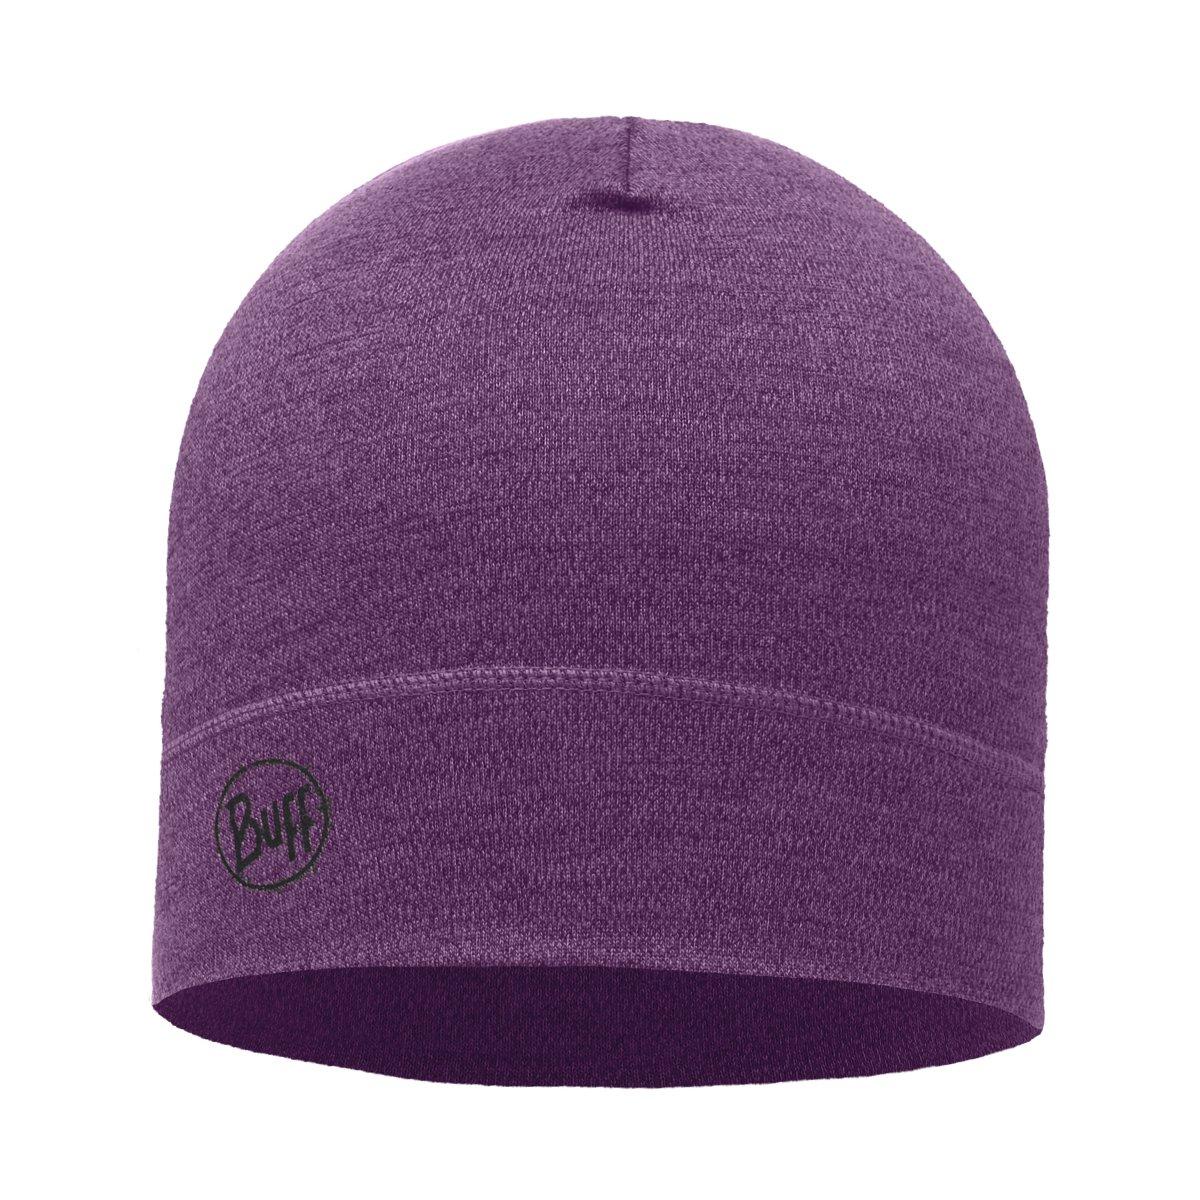 Amazon.com  Buff Midweight Merino Wool Hat c4cfcd803f7